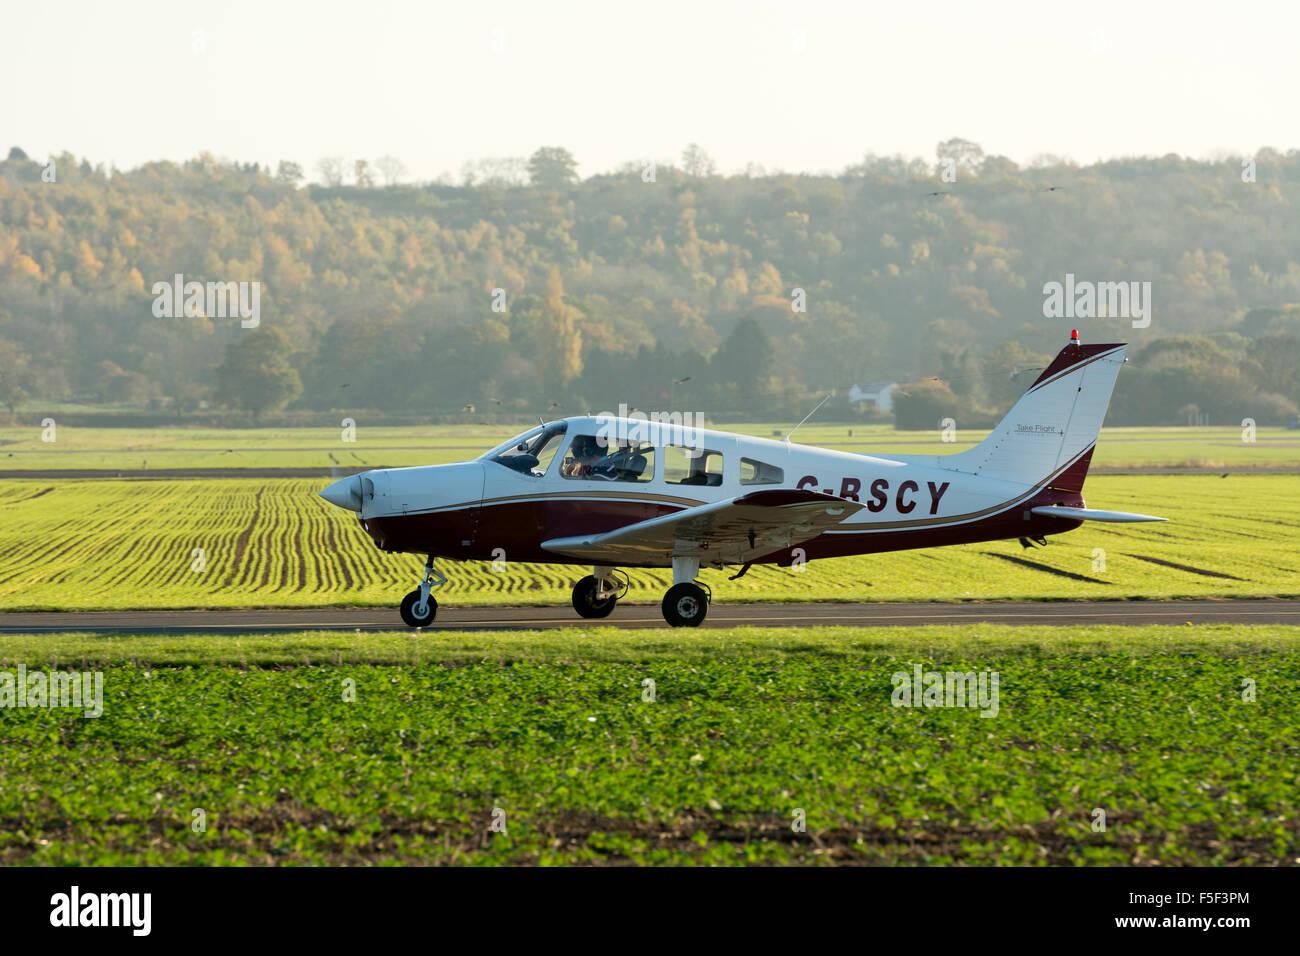 Piper PA-28 Cherokee Warrior at Wellesbourne Airfield, UK (G-BSCY) - Stock Image